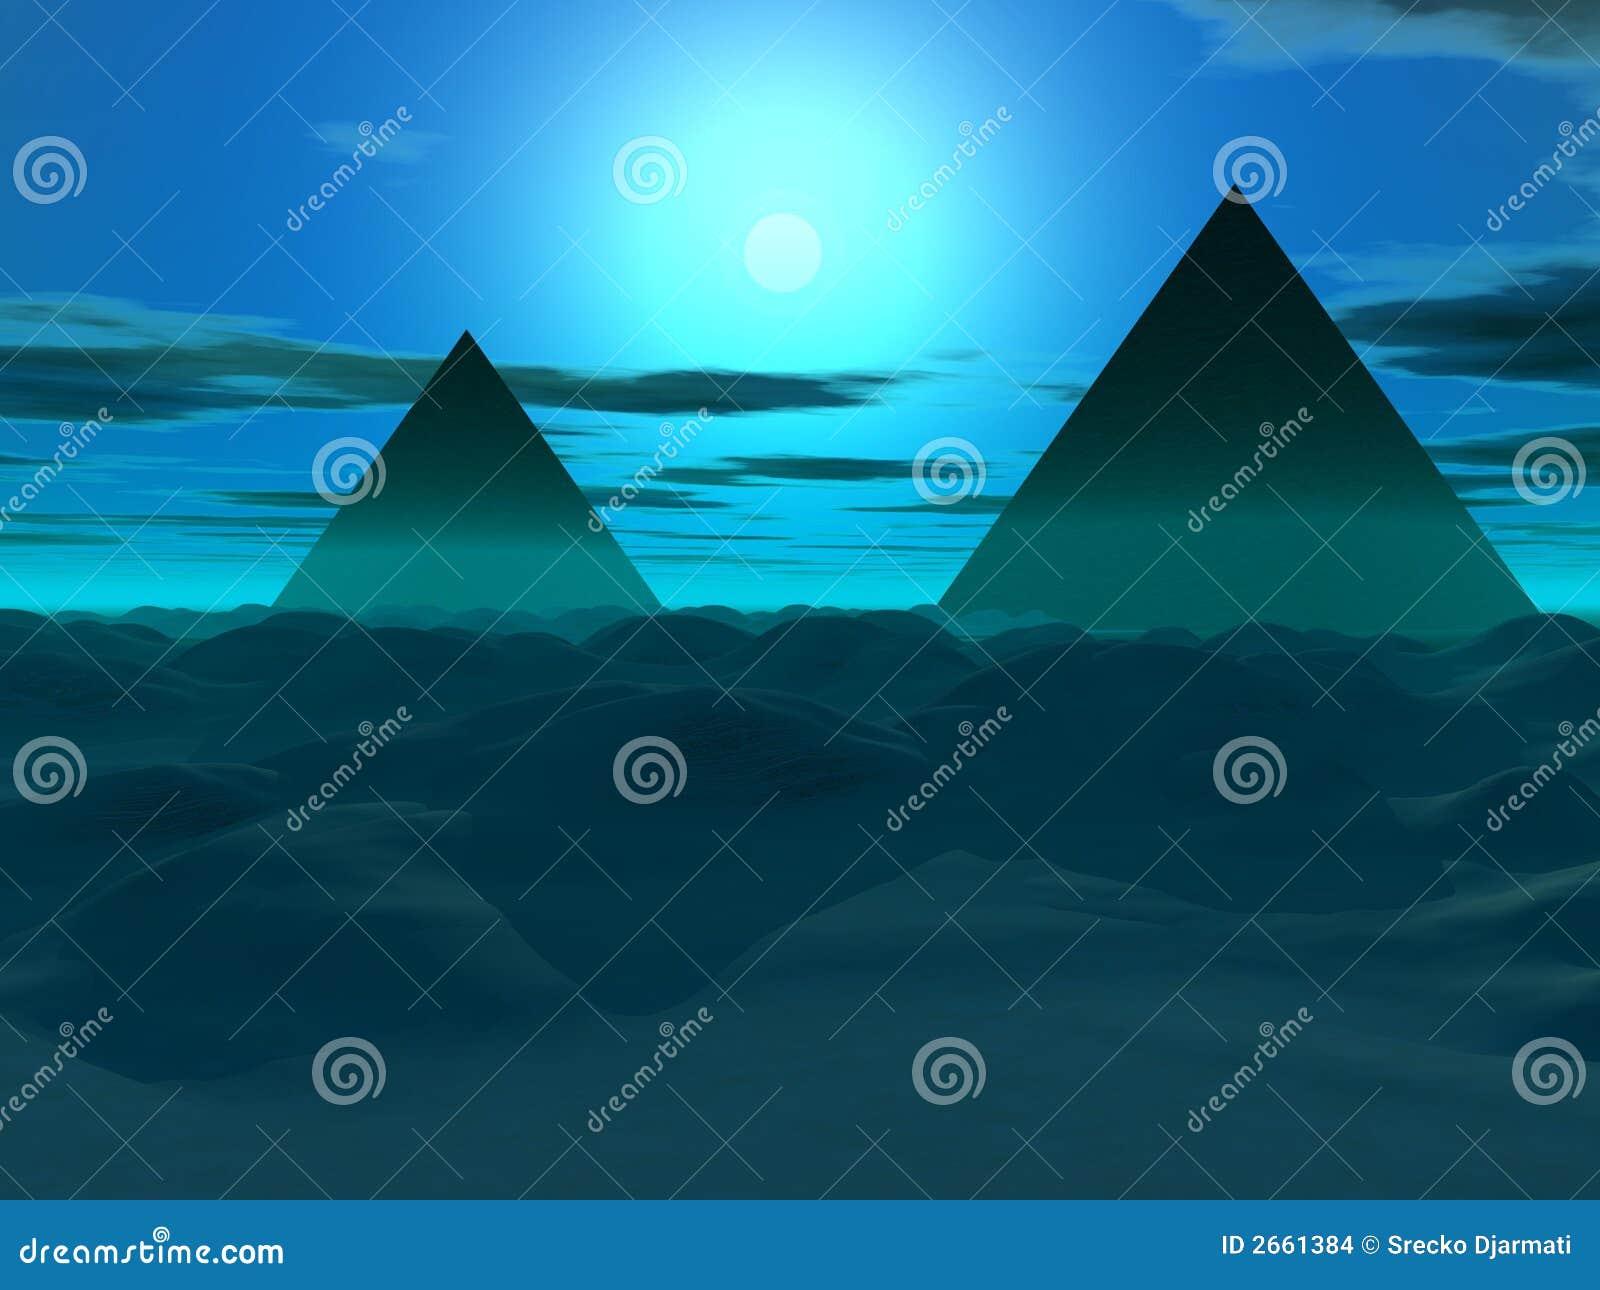 Piyramid